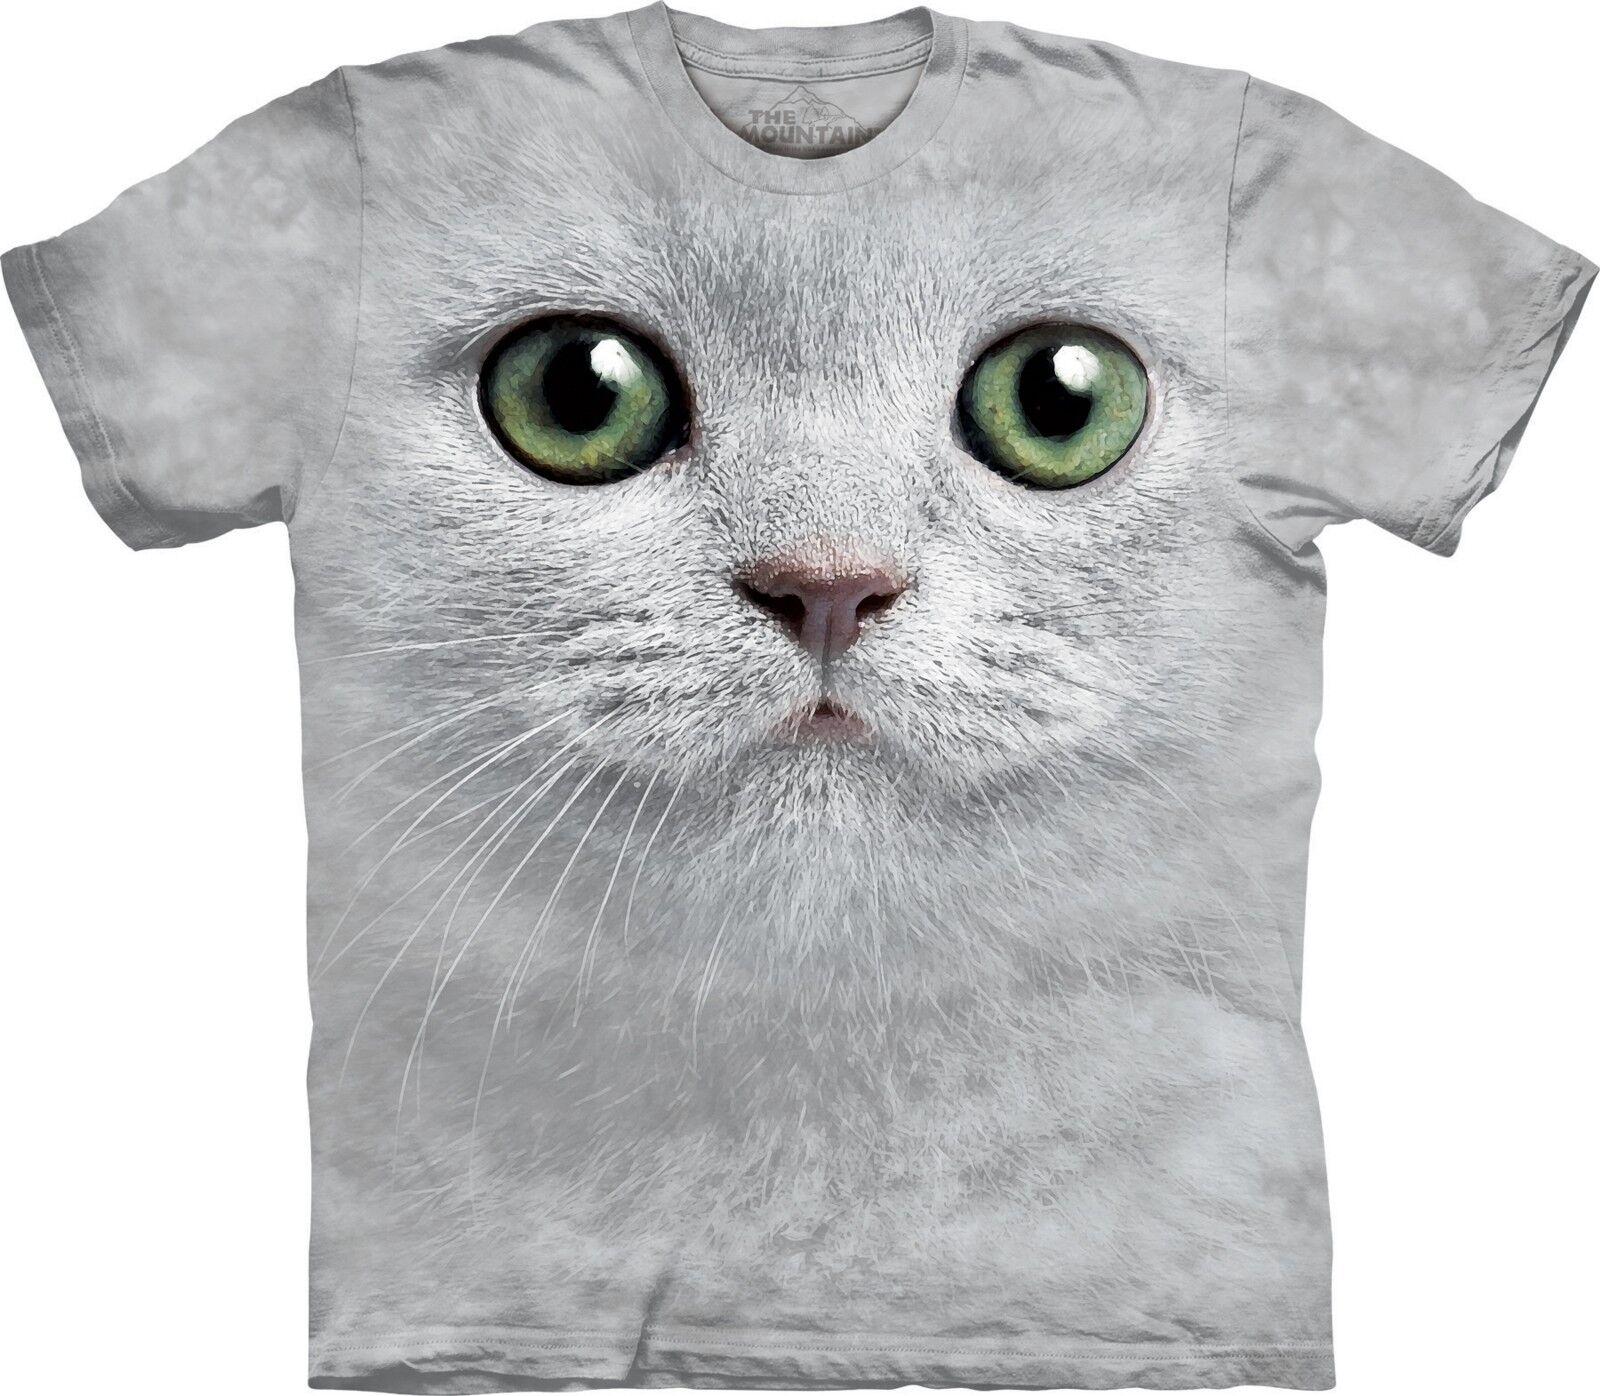 ed3e4002 Green Face Cats T Shirt Unisex The Mountain Adult Eyes ptqpdj4566-T ...